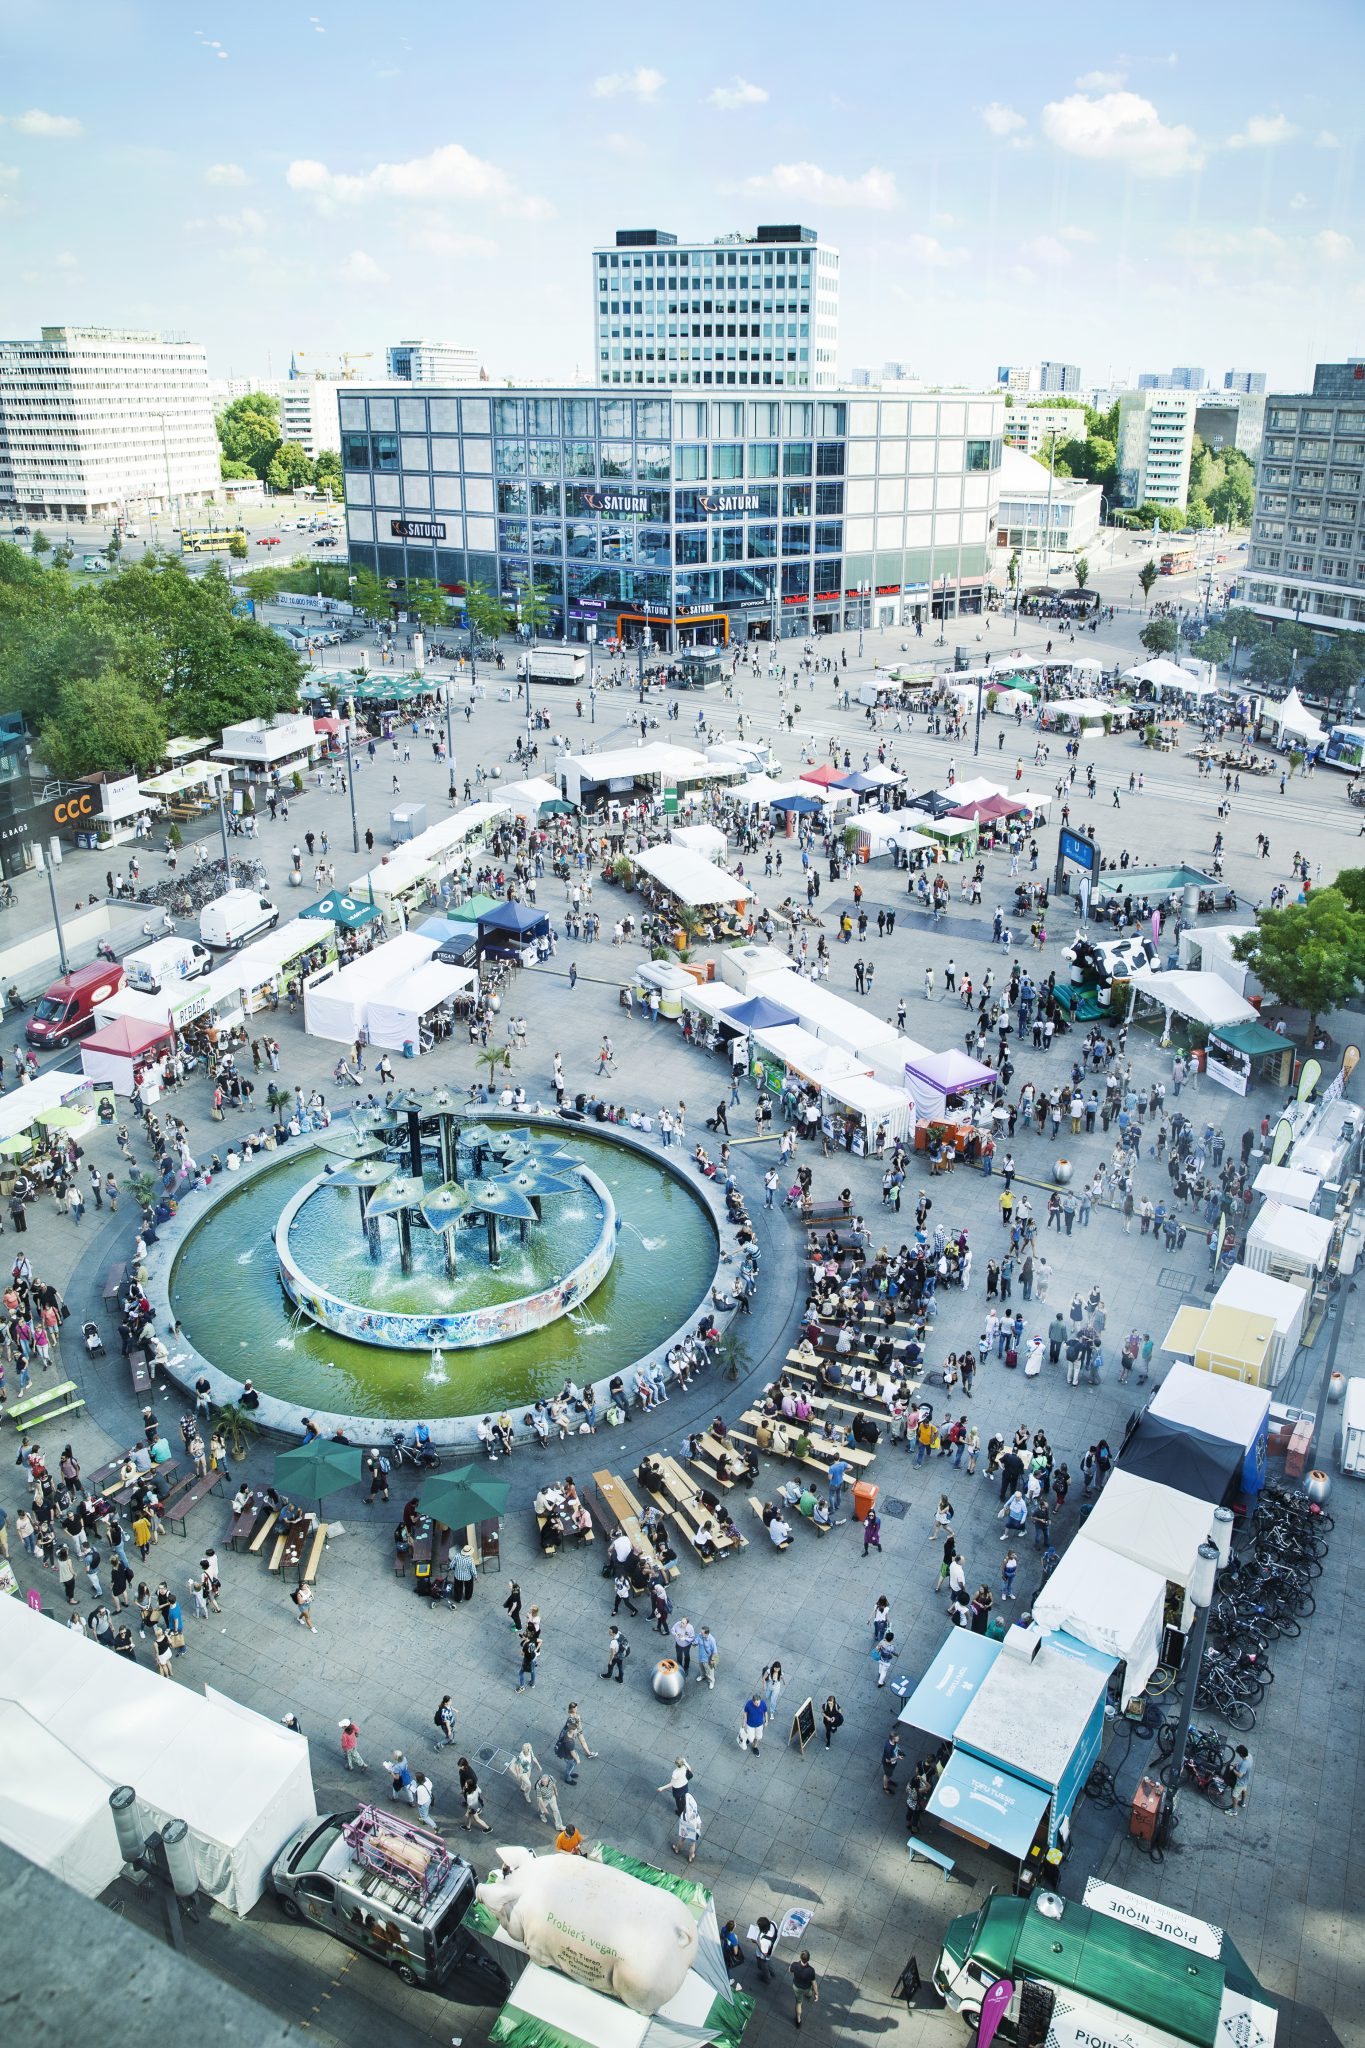 Veganes Sommerfest In Berlin